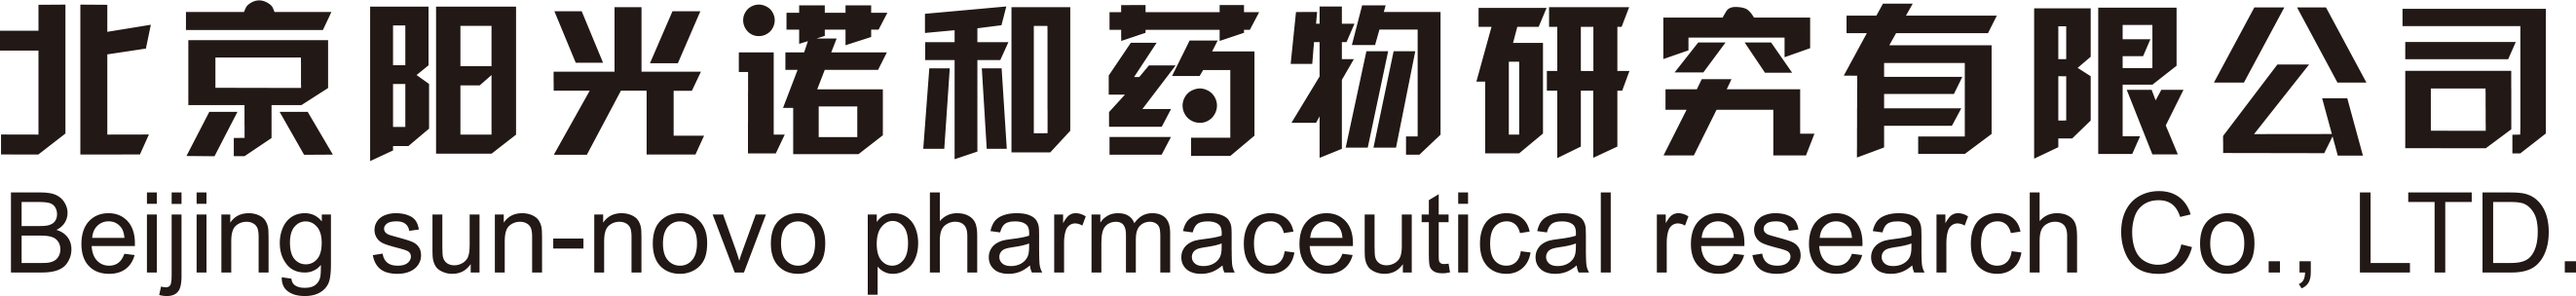 logo横版